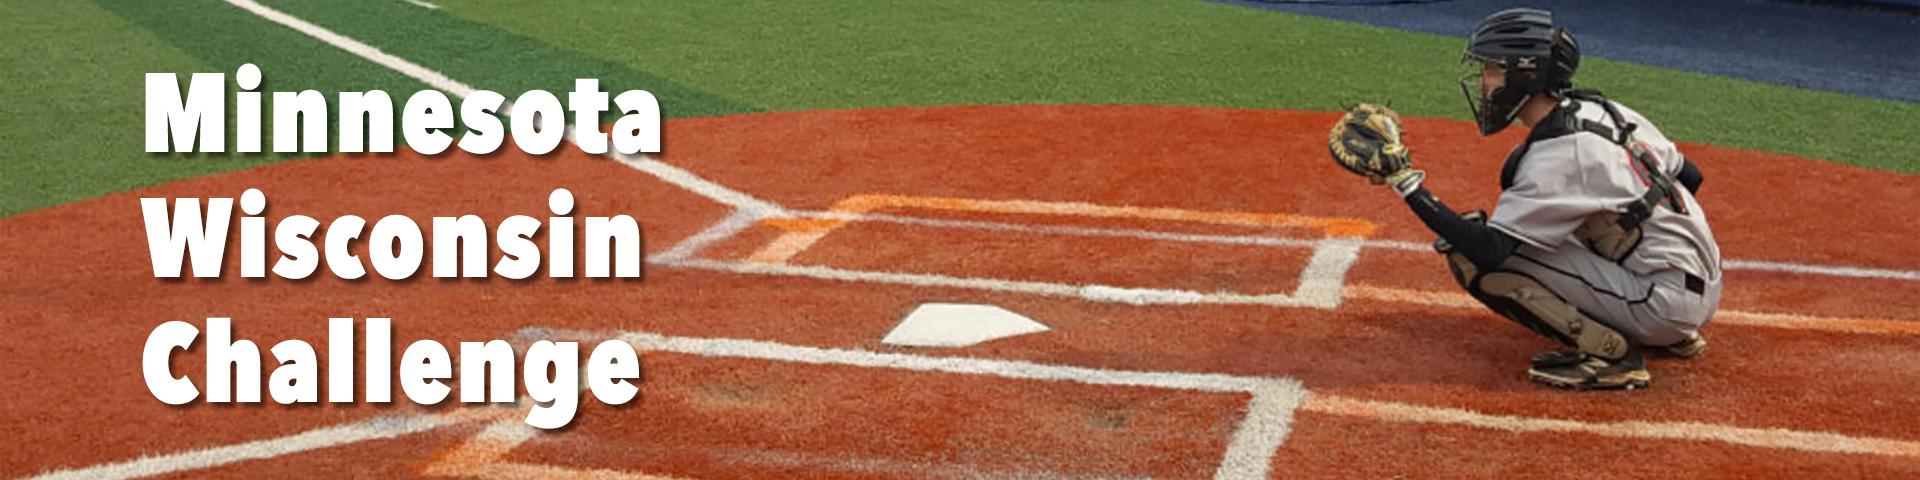 Minnesota Wisconsin Baseball Challenge banner